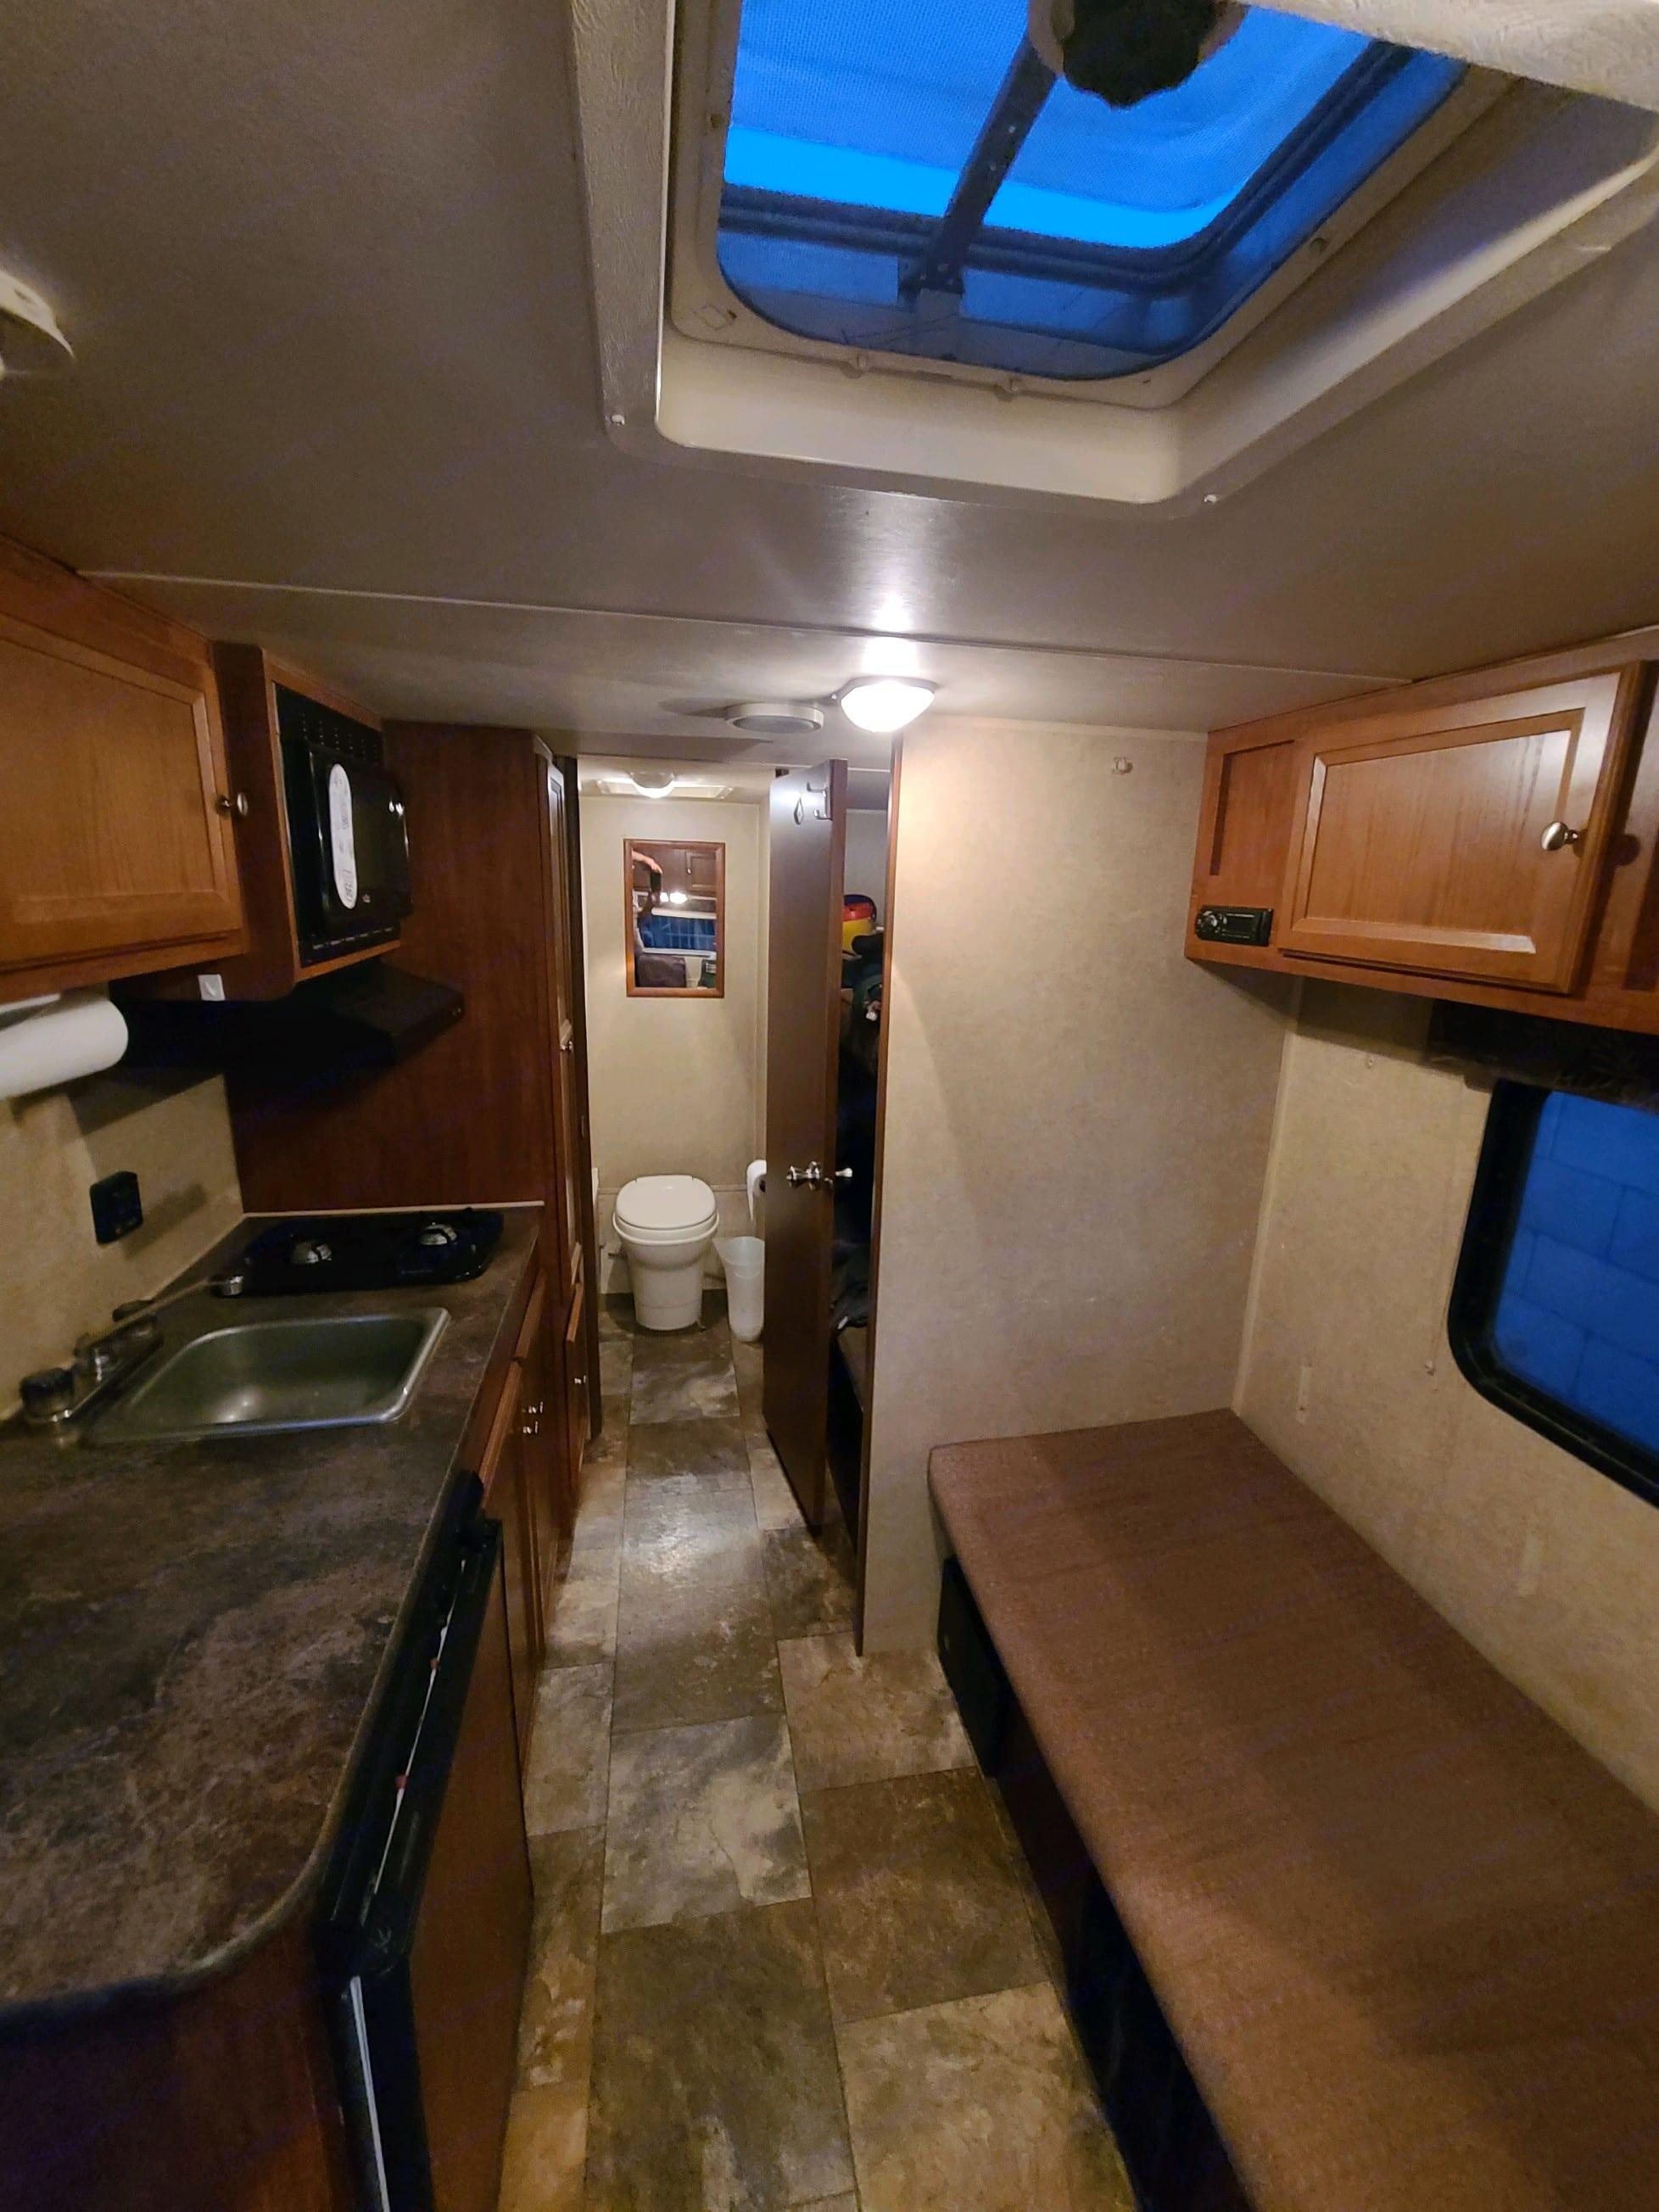 couch, radio, bunks, kitchen, bathroom. Jayco Jay Flight Swift 2014